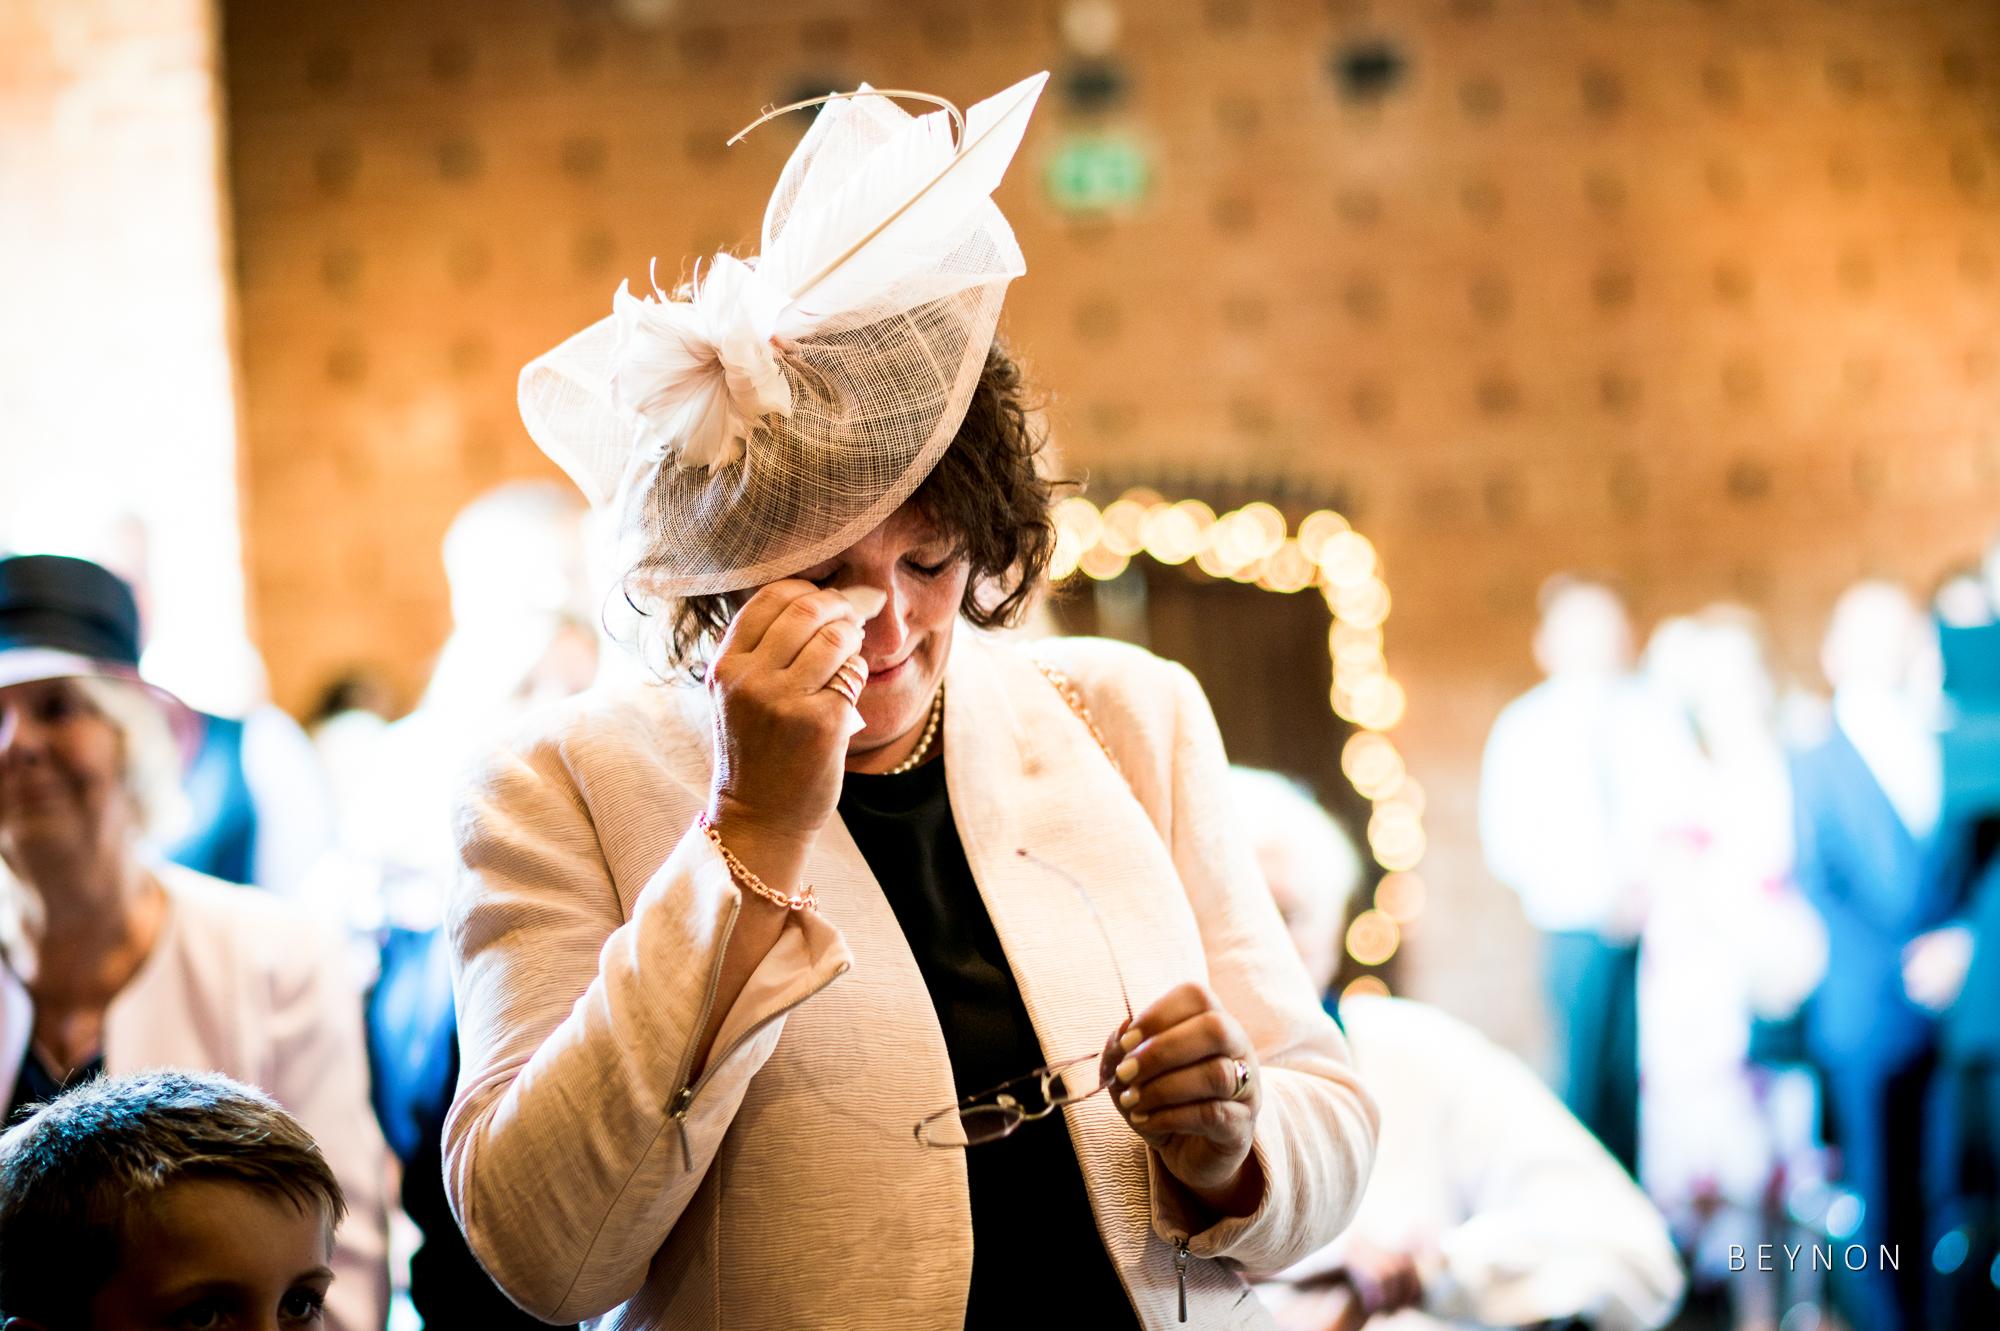 Mum wipes away tear